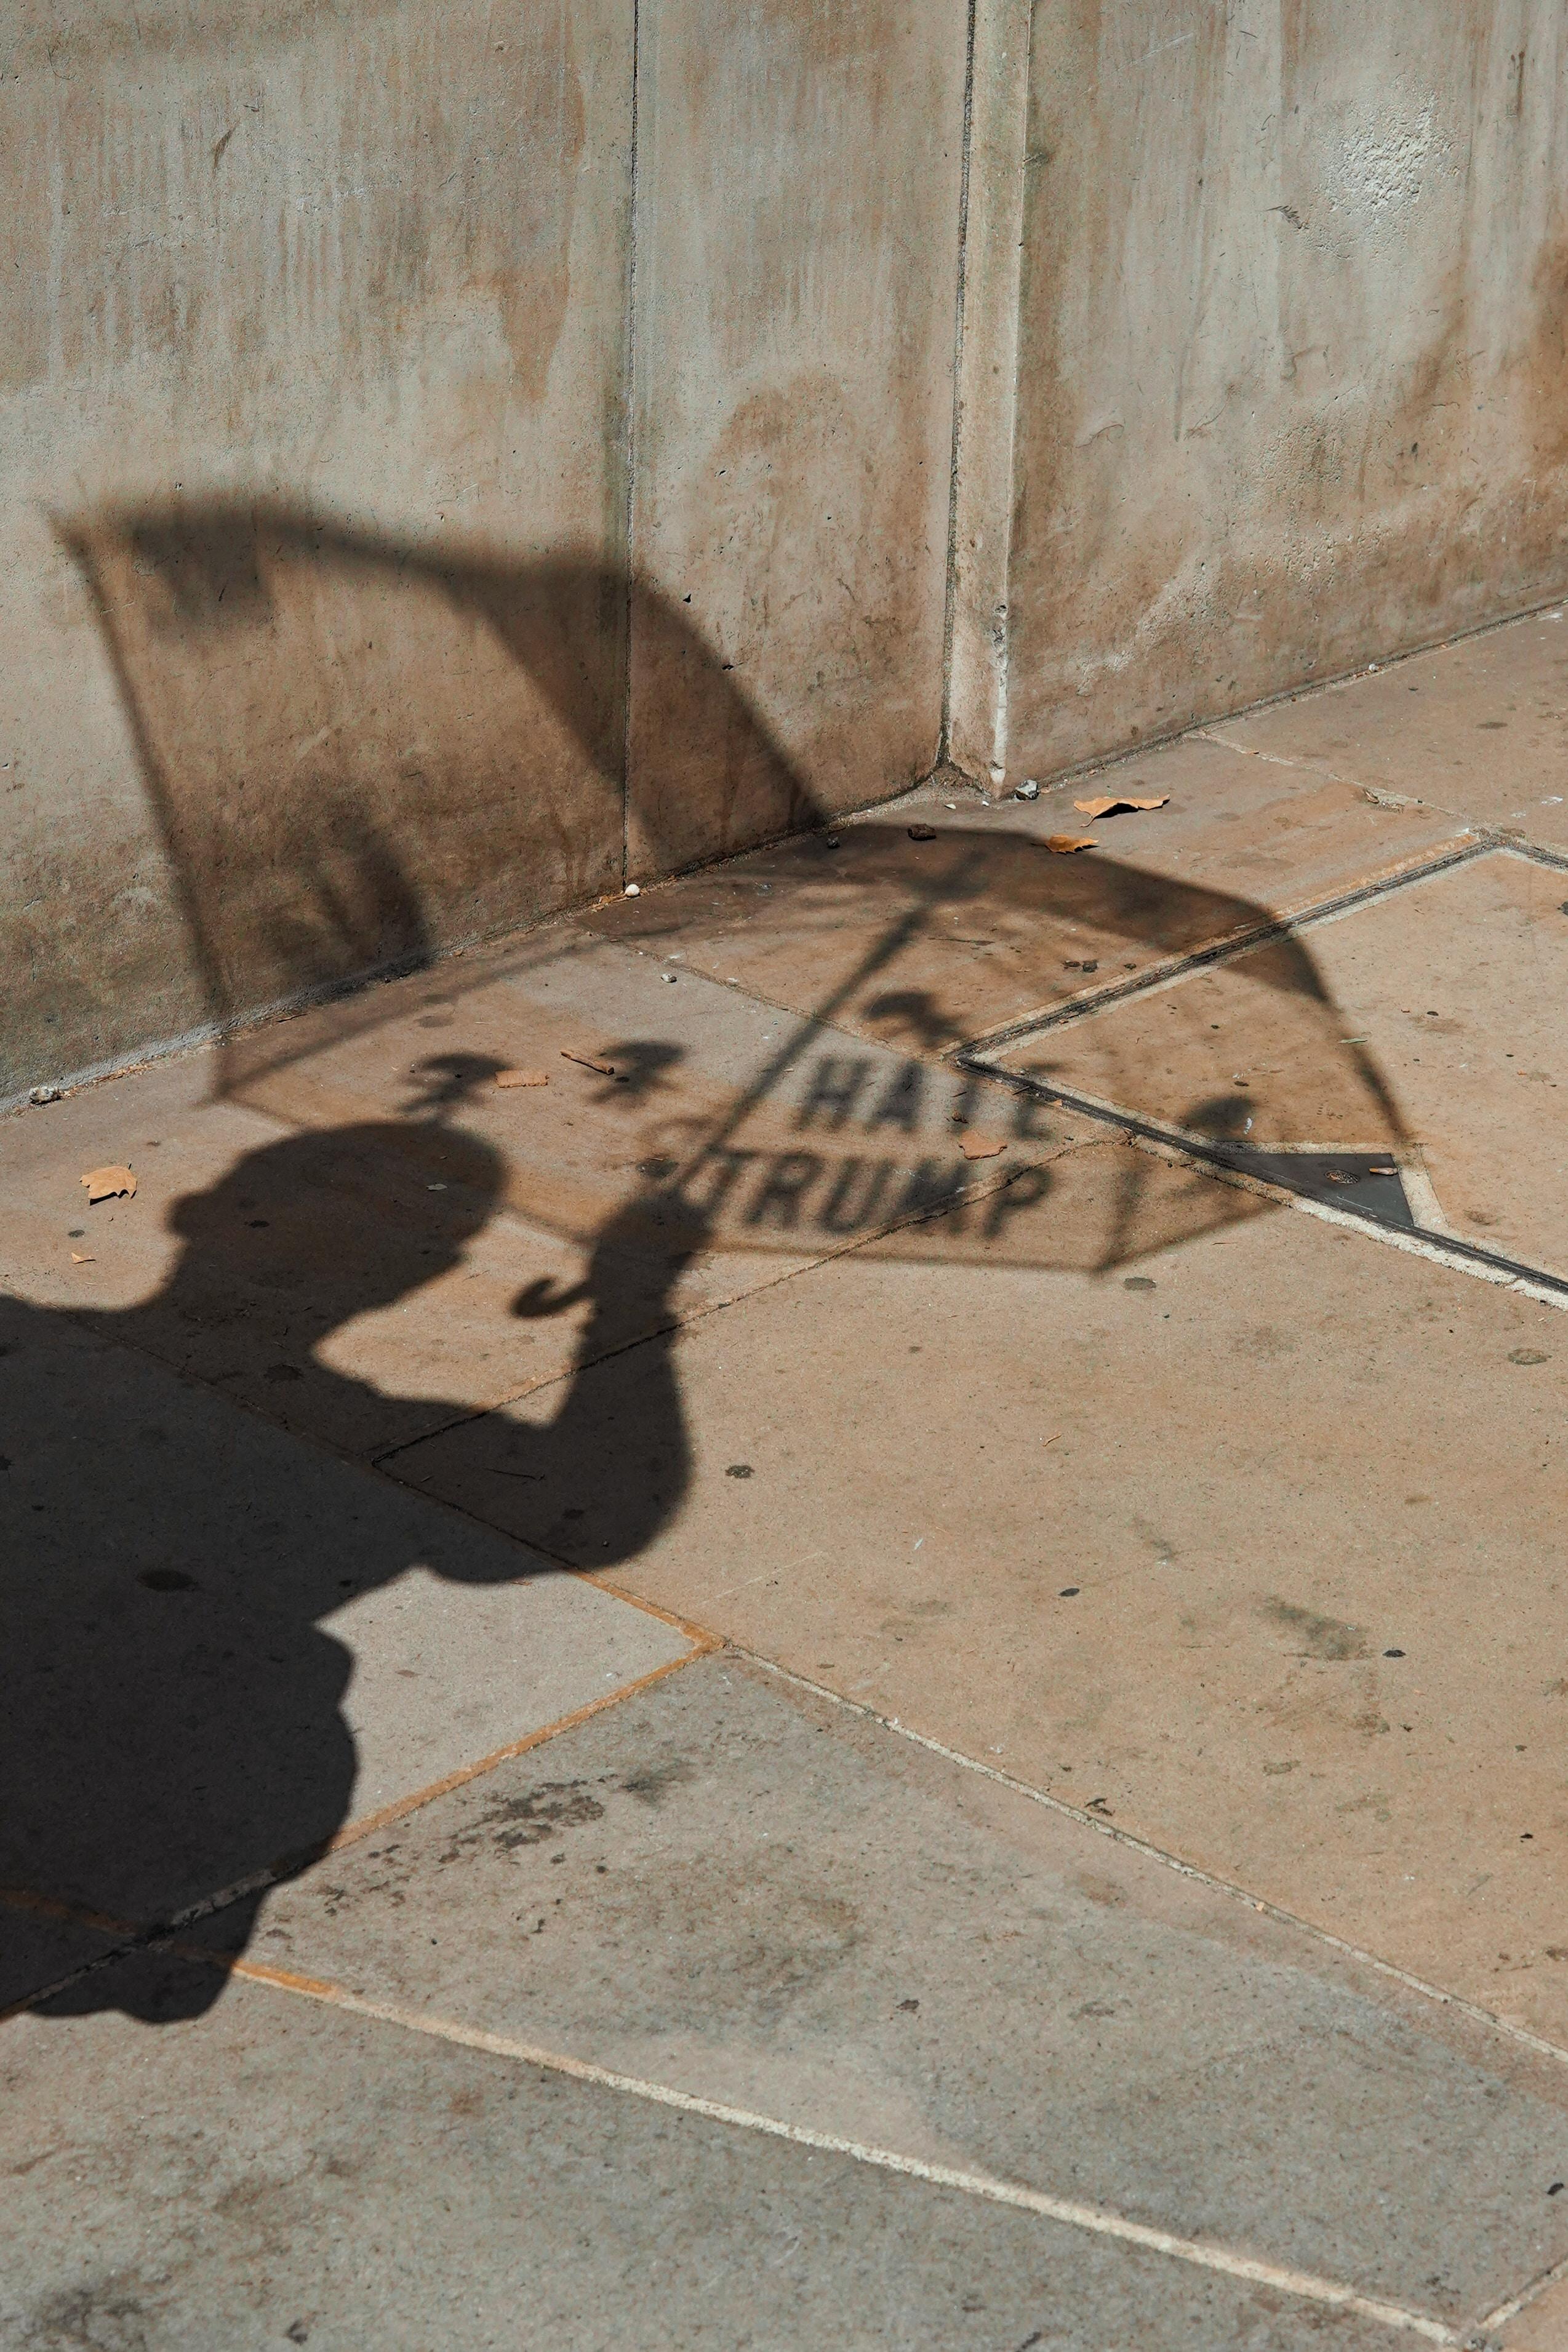 man holding umbrella silhouette